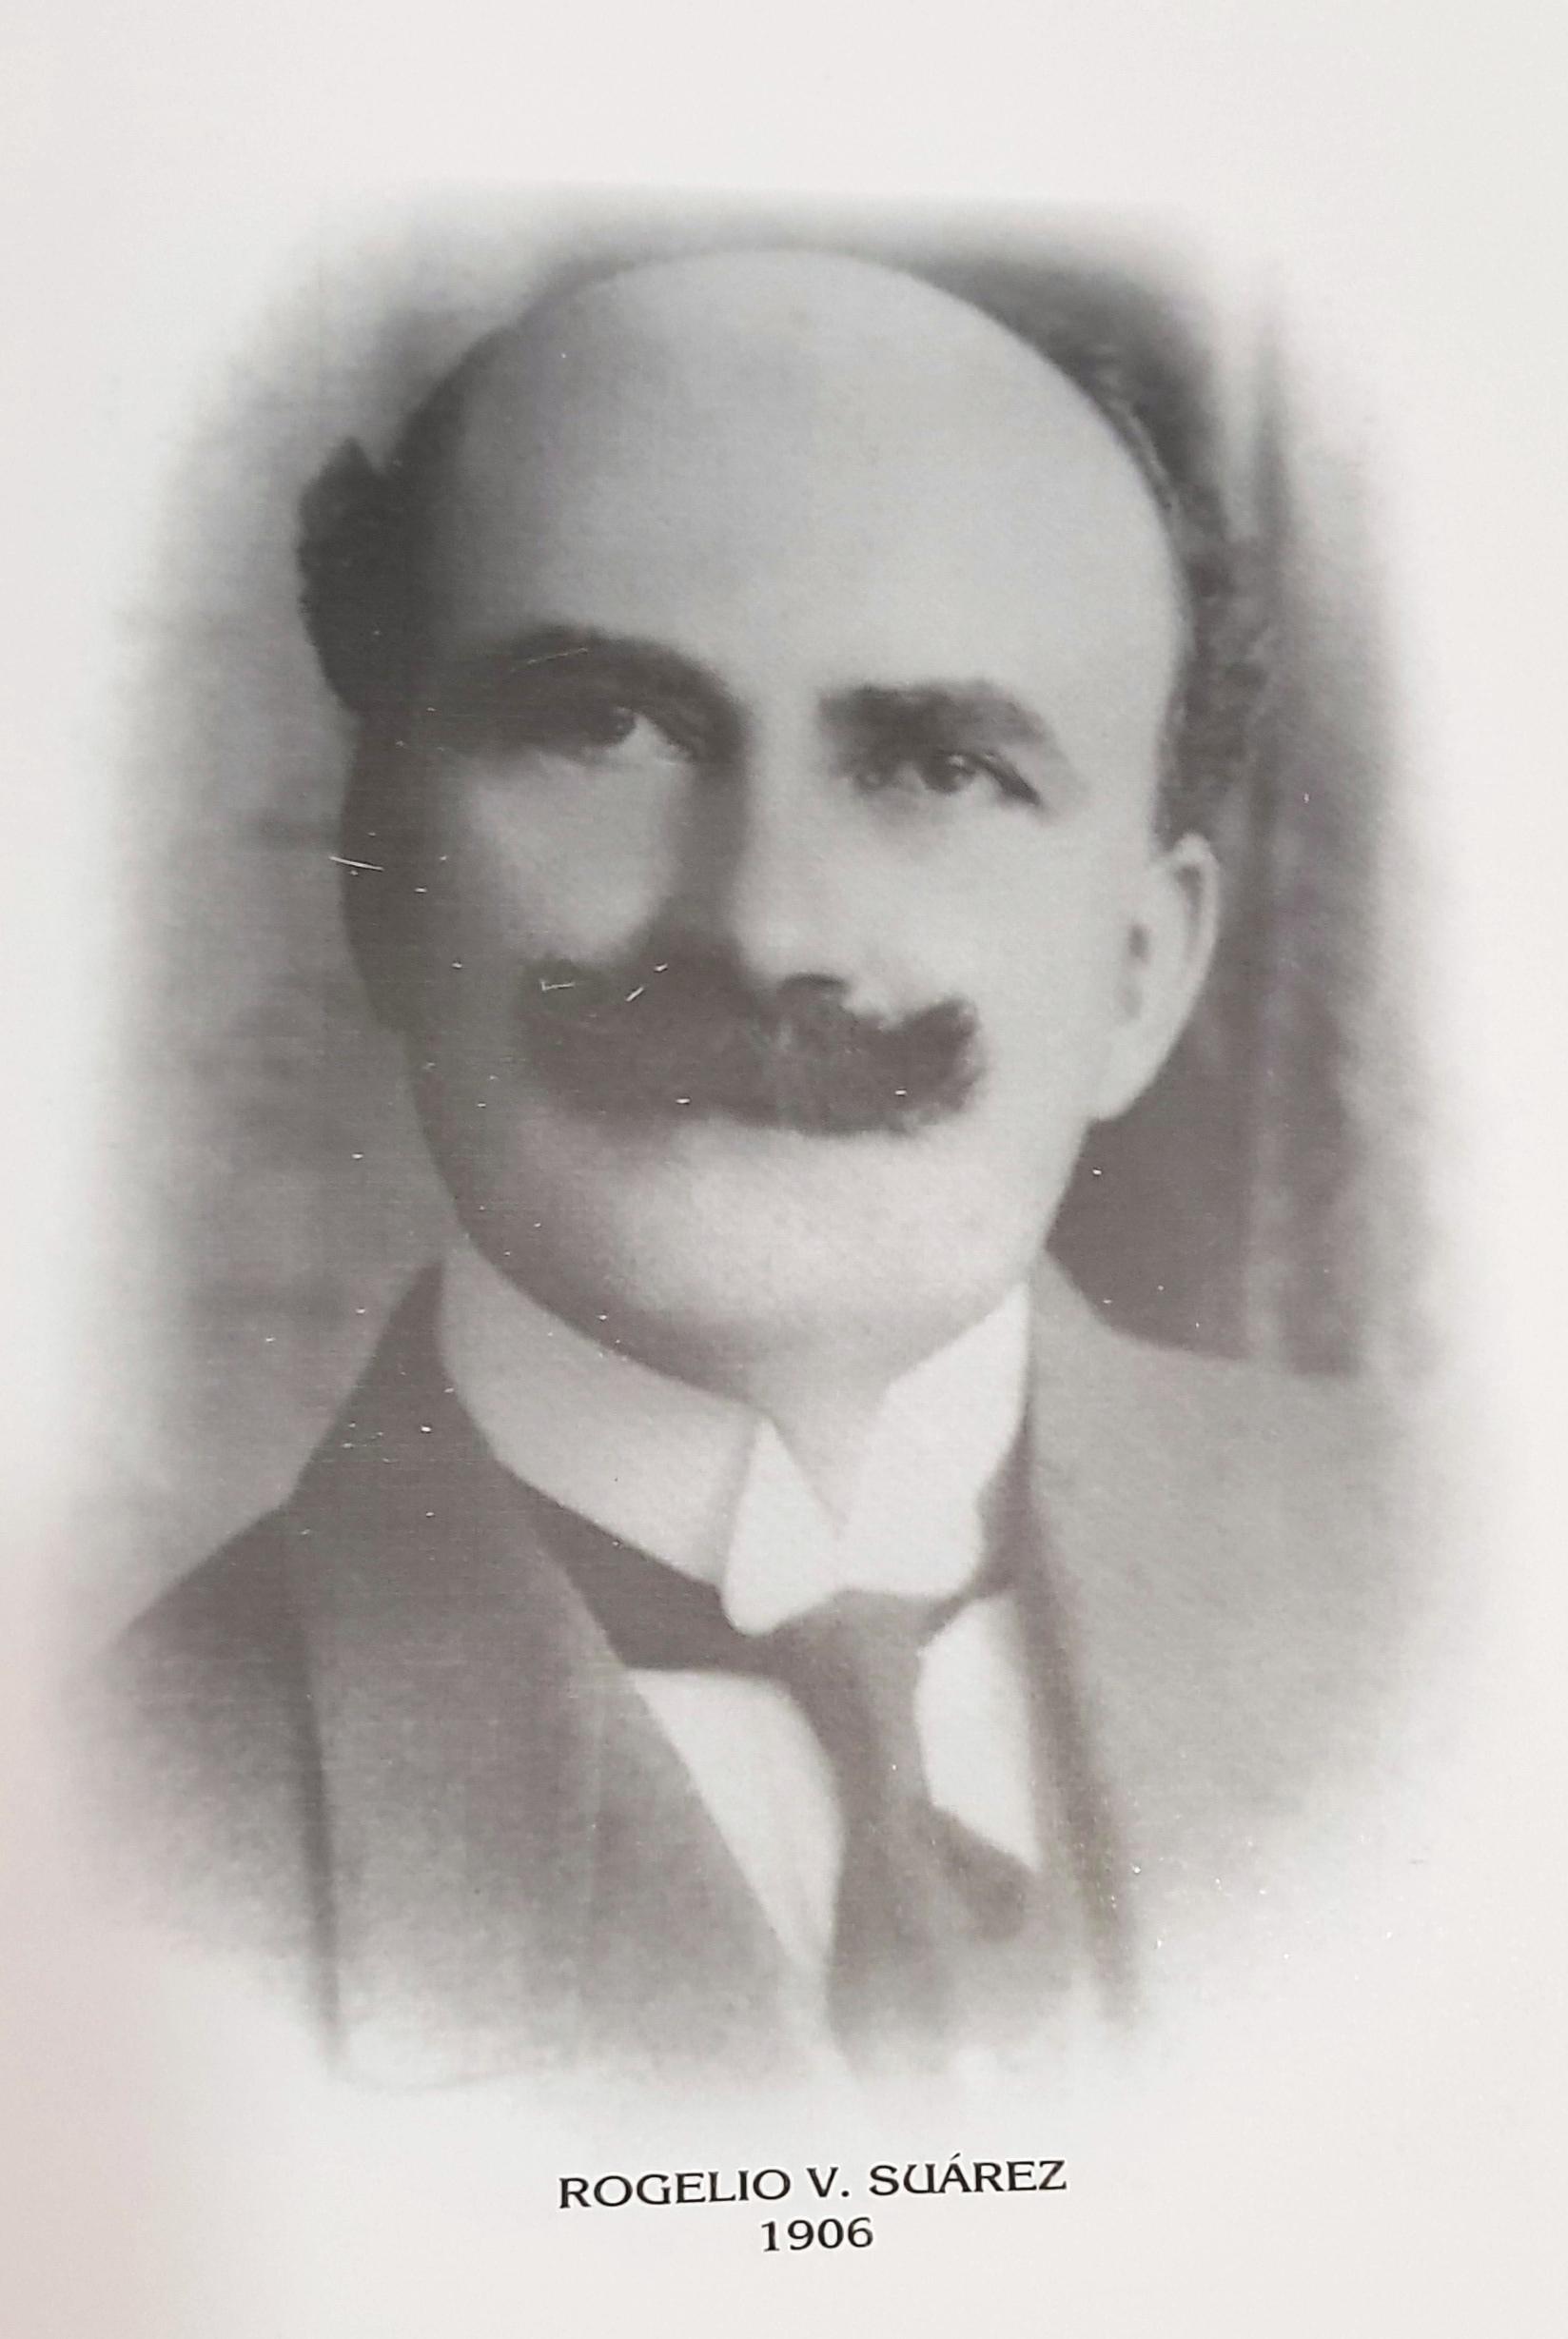 PRESIDENTE DE LA CÁMARA DE COMERCIO DE MÉRIDA SR. ROGELIO V. SUAREZ